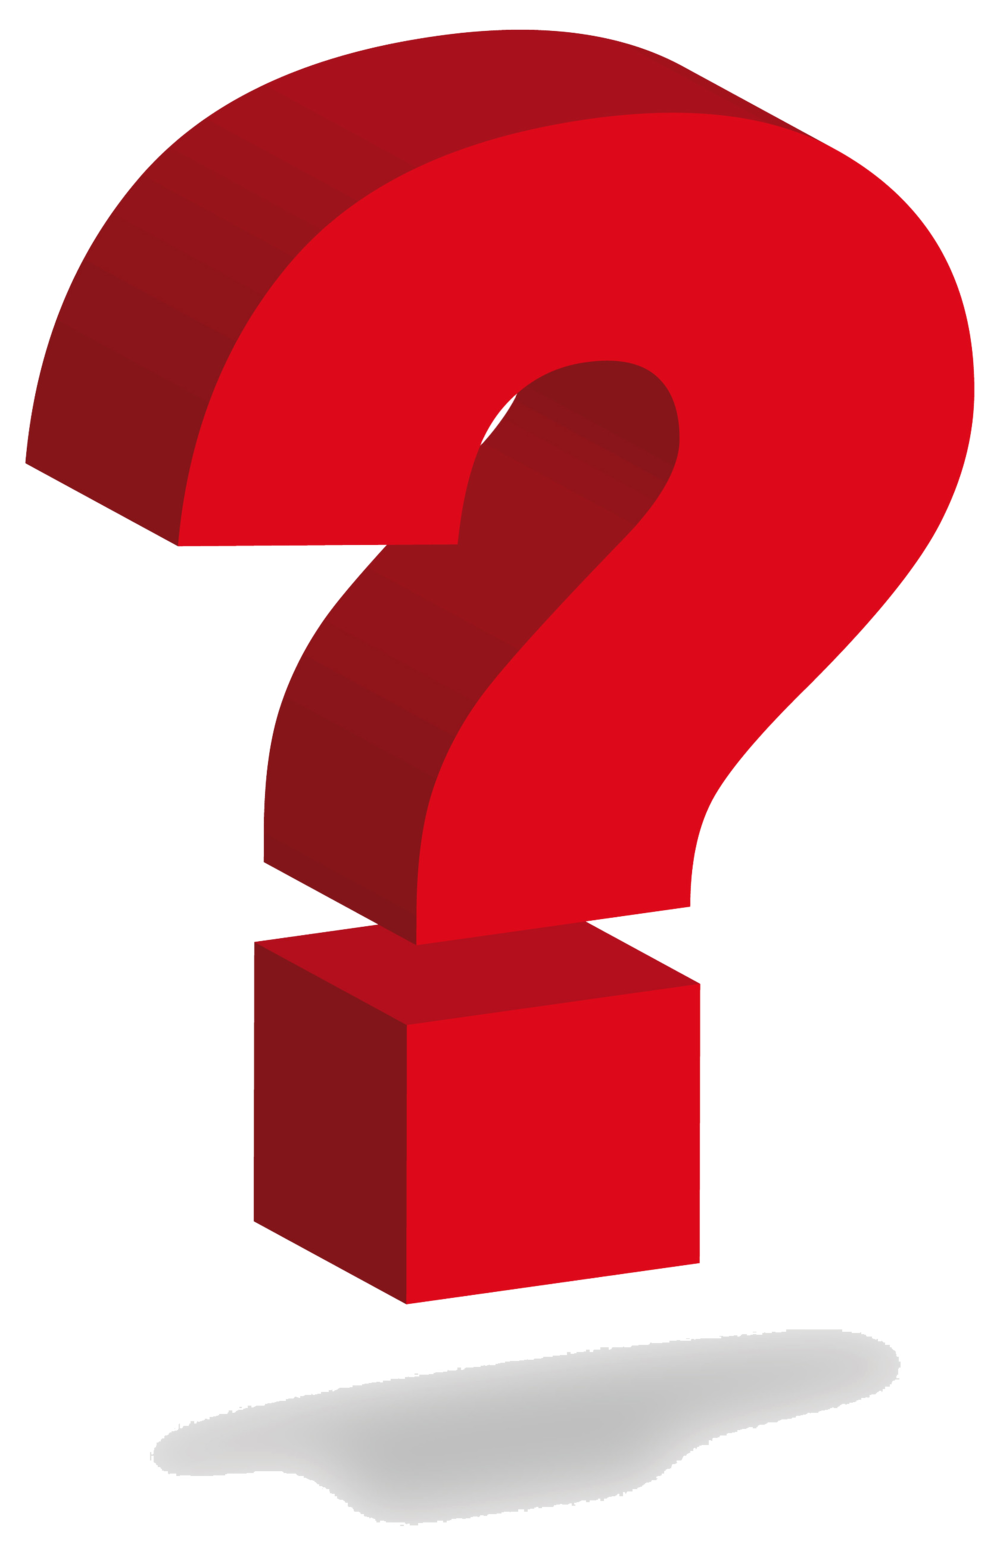 1000x1551 Red Question Mark Clipart Clipartfox